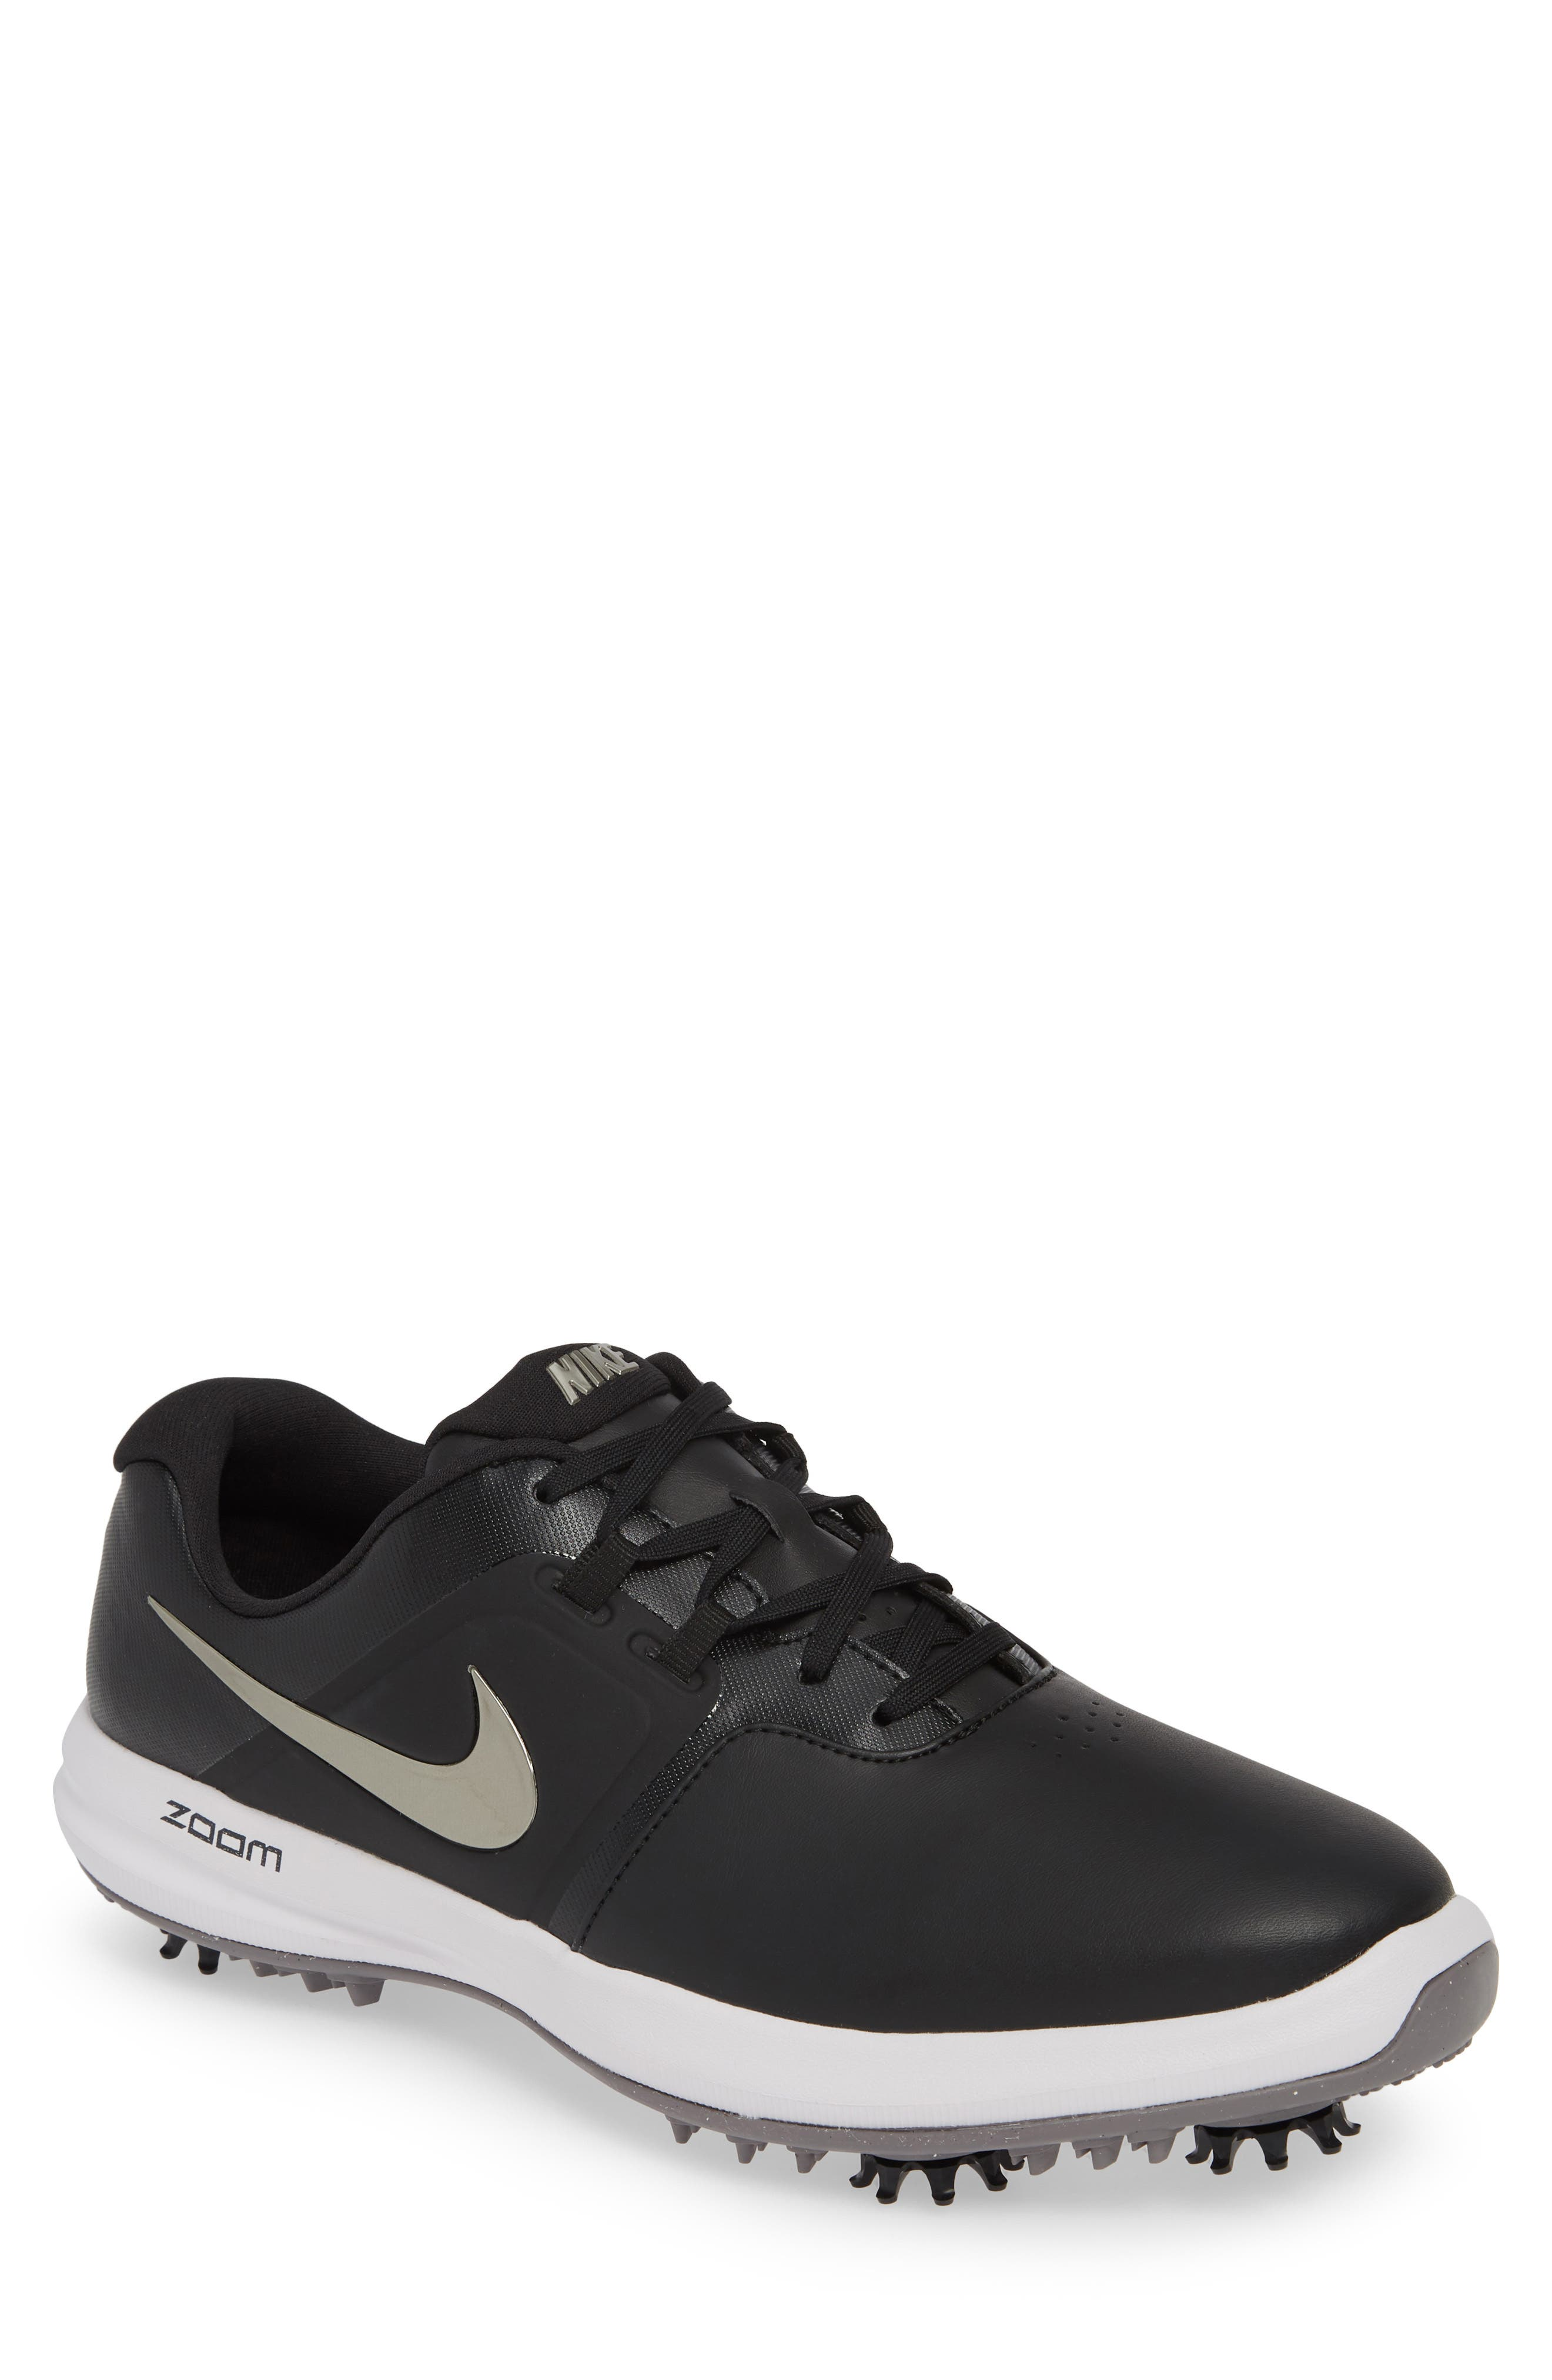 NIKE Air Zoom Victory Golf Shoe, Main, color, BLACK/ PEWTER/ VAST GREY